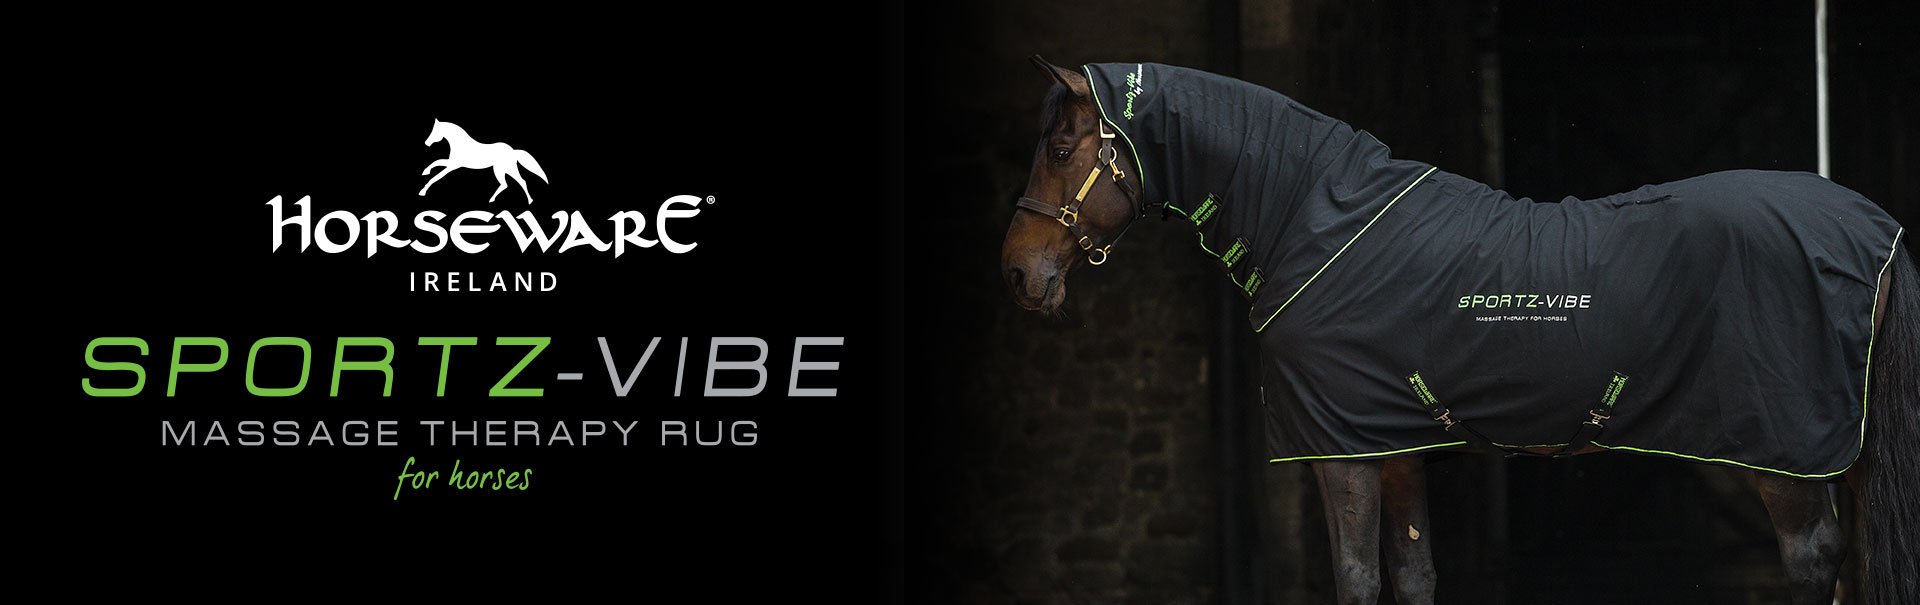 Horseware Sportz-Vibe